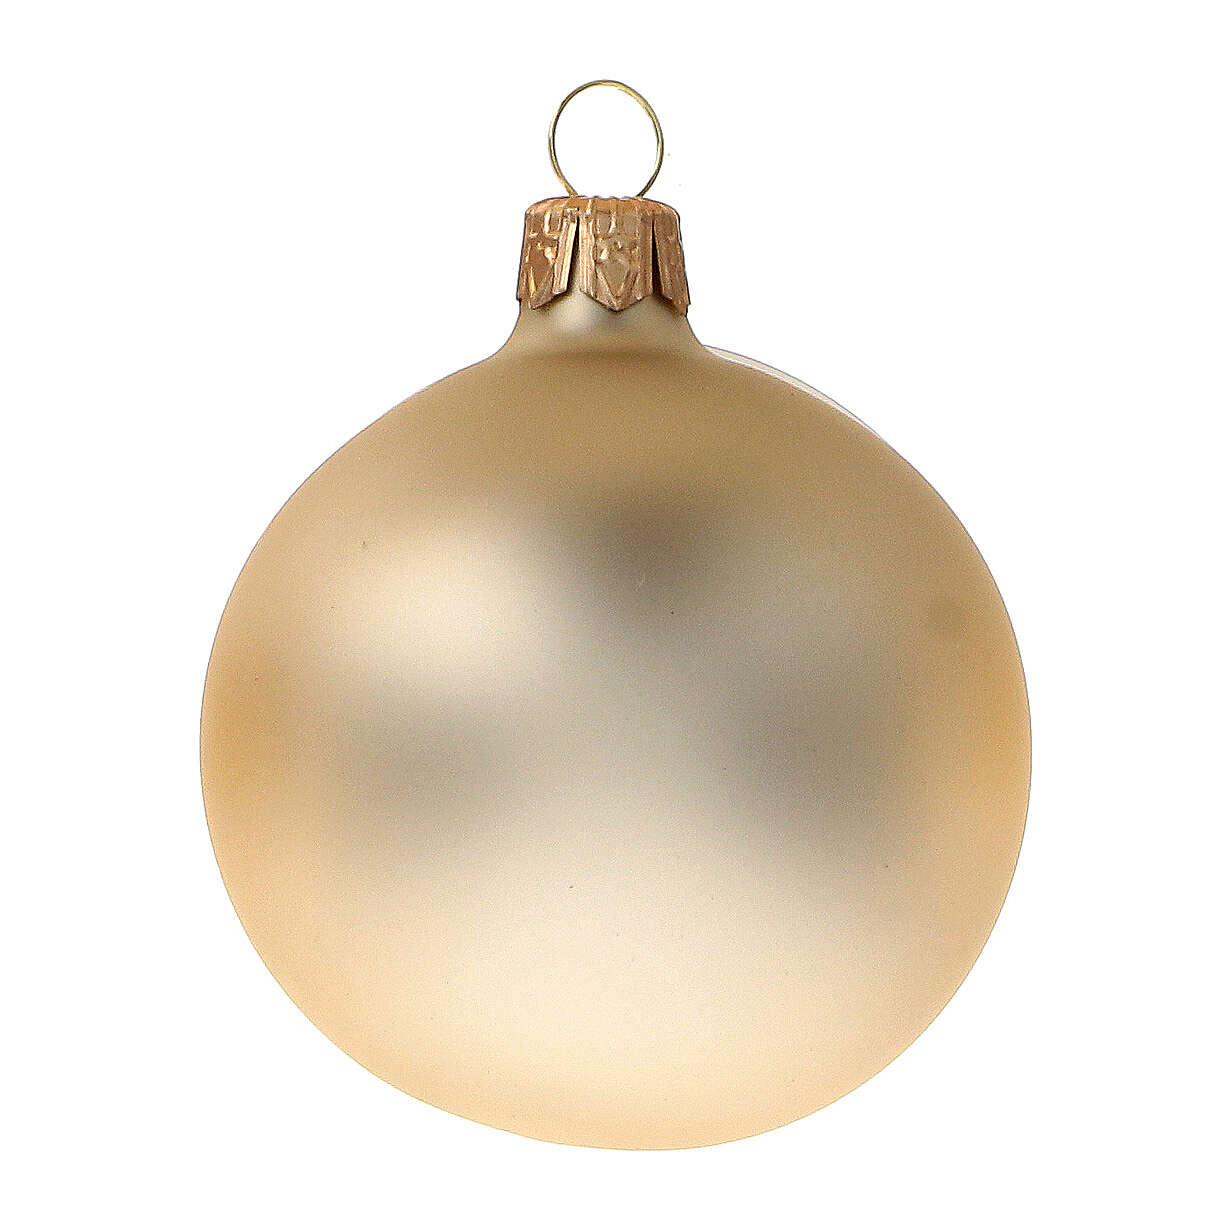 Bolas árvore de Natal vidro soprado ouro opaco 60 mm 6 unidades 4